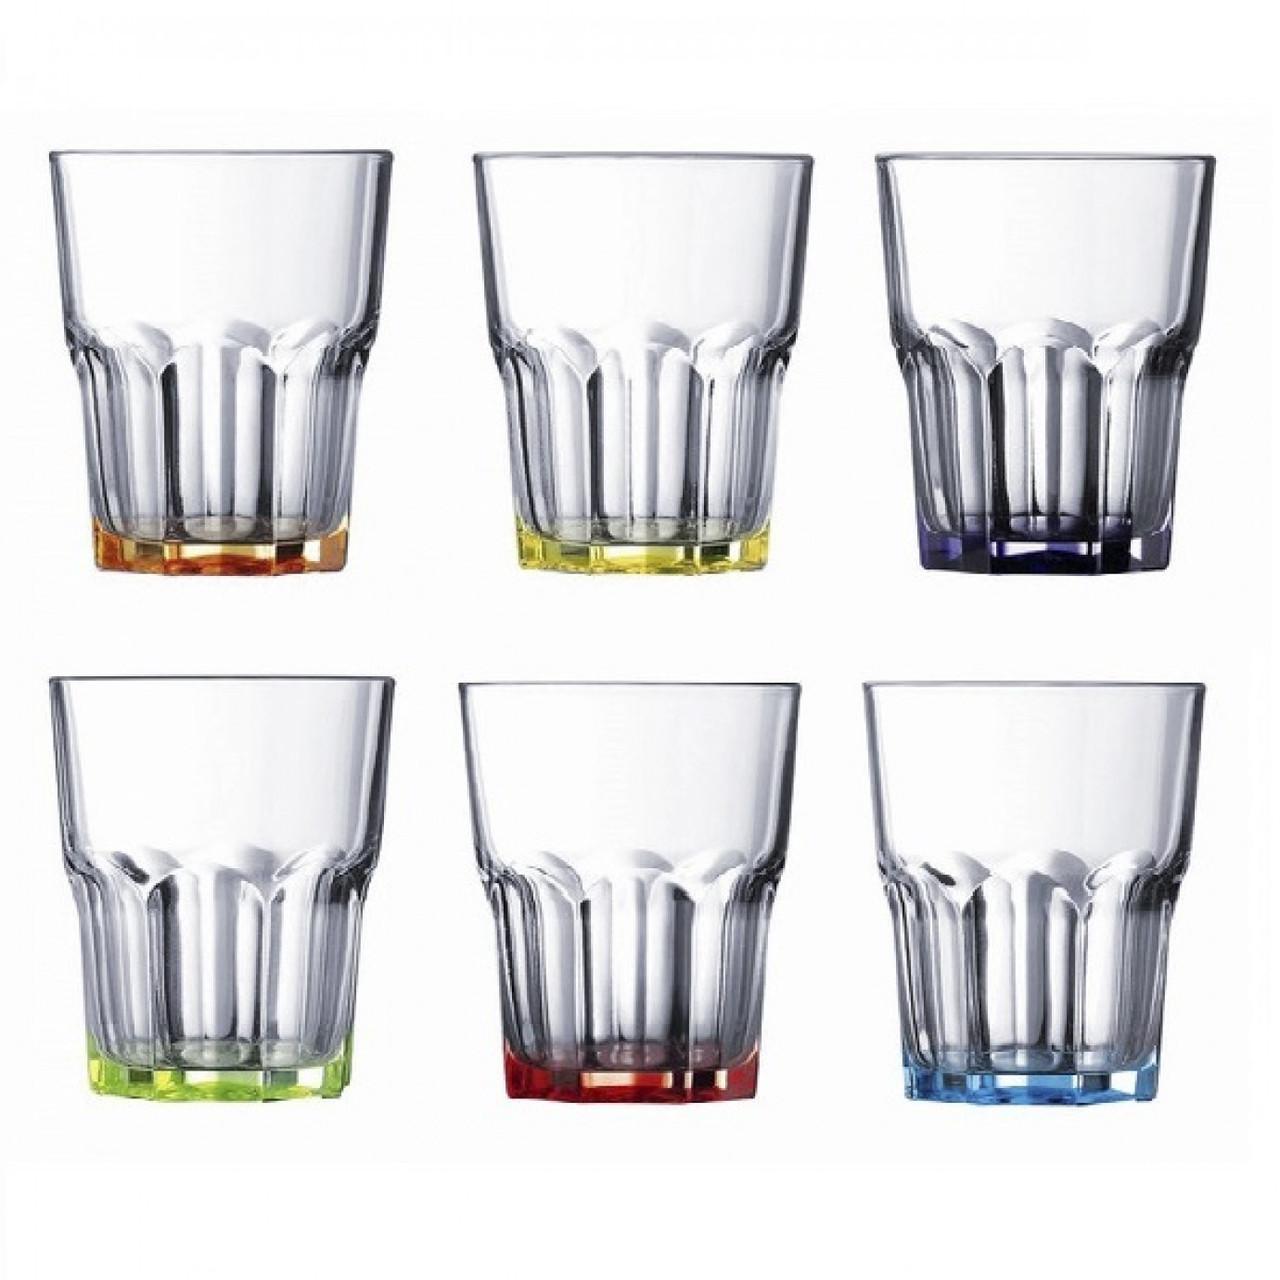 "Набор стаканов стекло ""Luminarc. Брайт Колорс Новая Америка"" (6шт) 270мл 17782 / 8933"